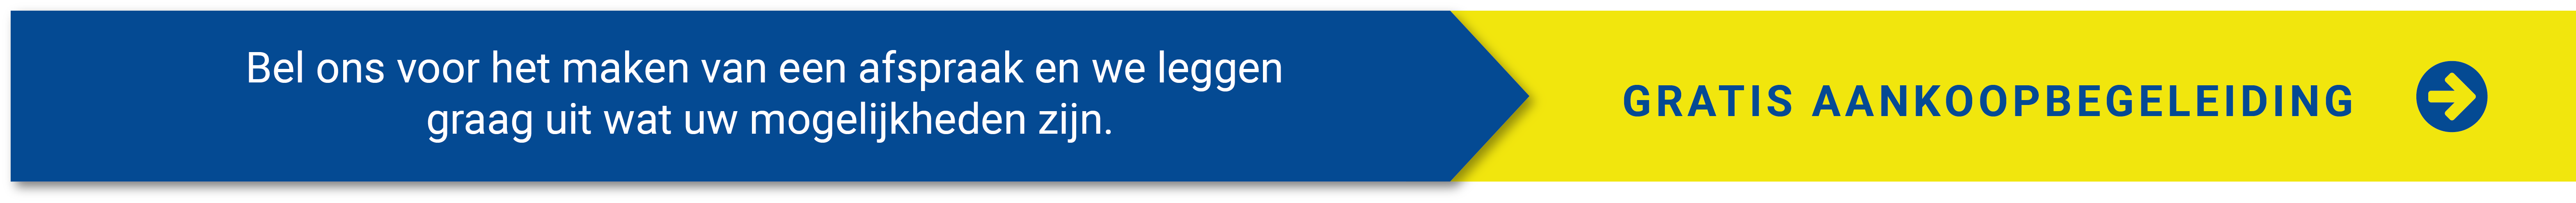 button aankoopbegeleiding